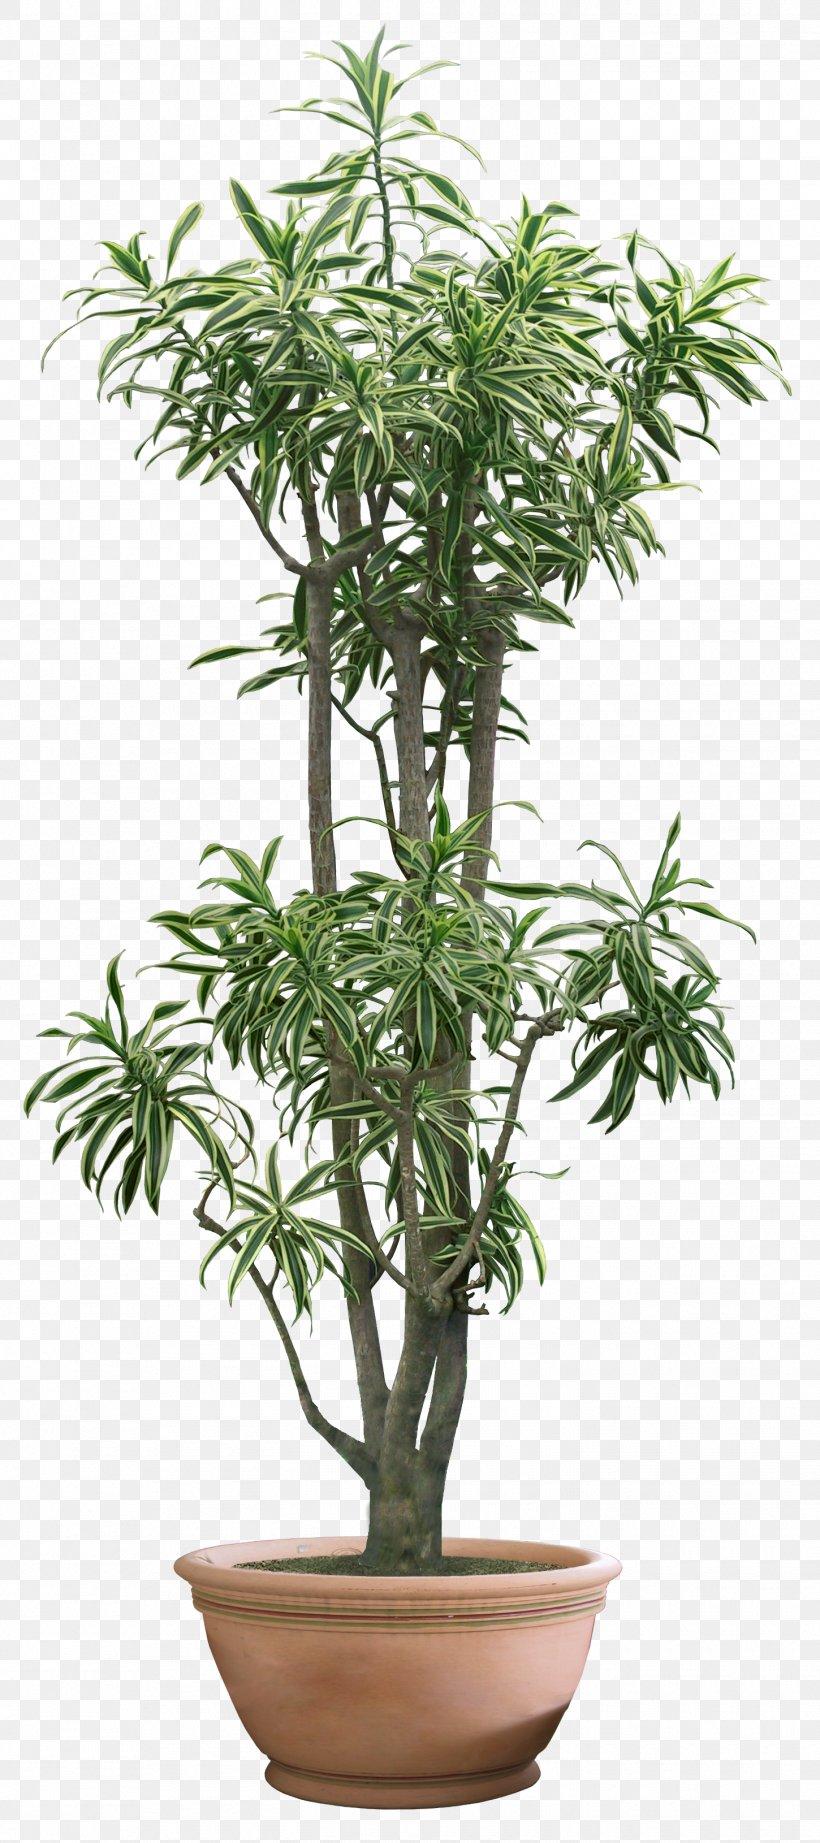 Tree Bamboo Houseplant Bonsai Penjing Png 1450x3260px Tree Bamboo Bonsai Chamaedorea Elegans Cycad Download Free